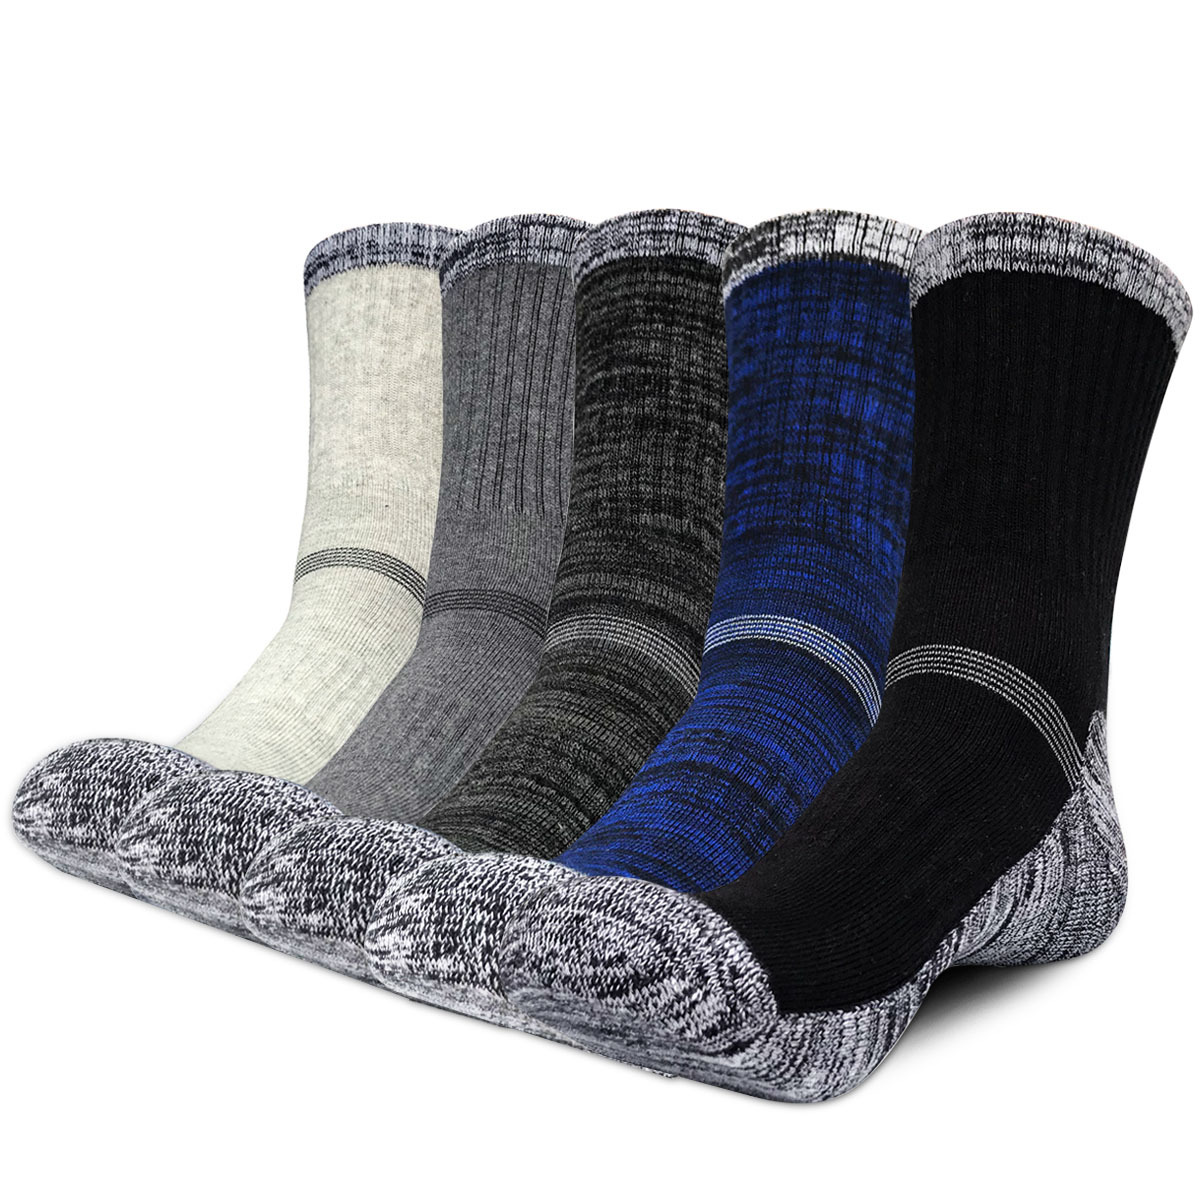 Winter Men Socks Thicken Thermal Wool Pile Cashmere Snow Socks Climbing Hiking Sport